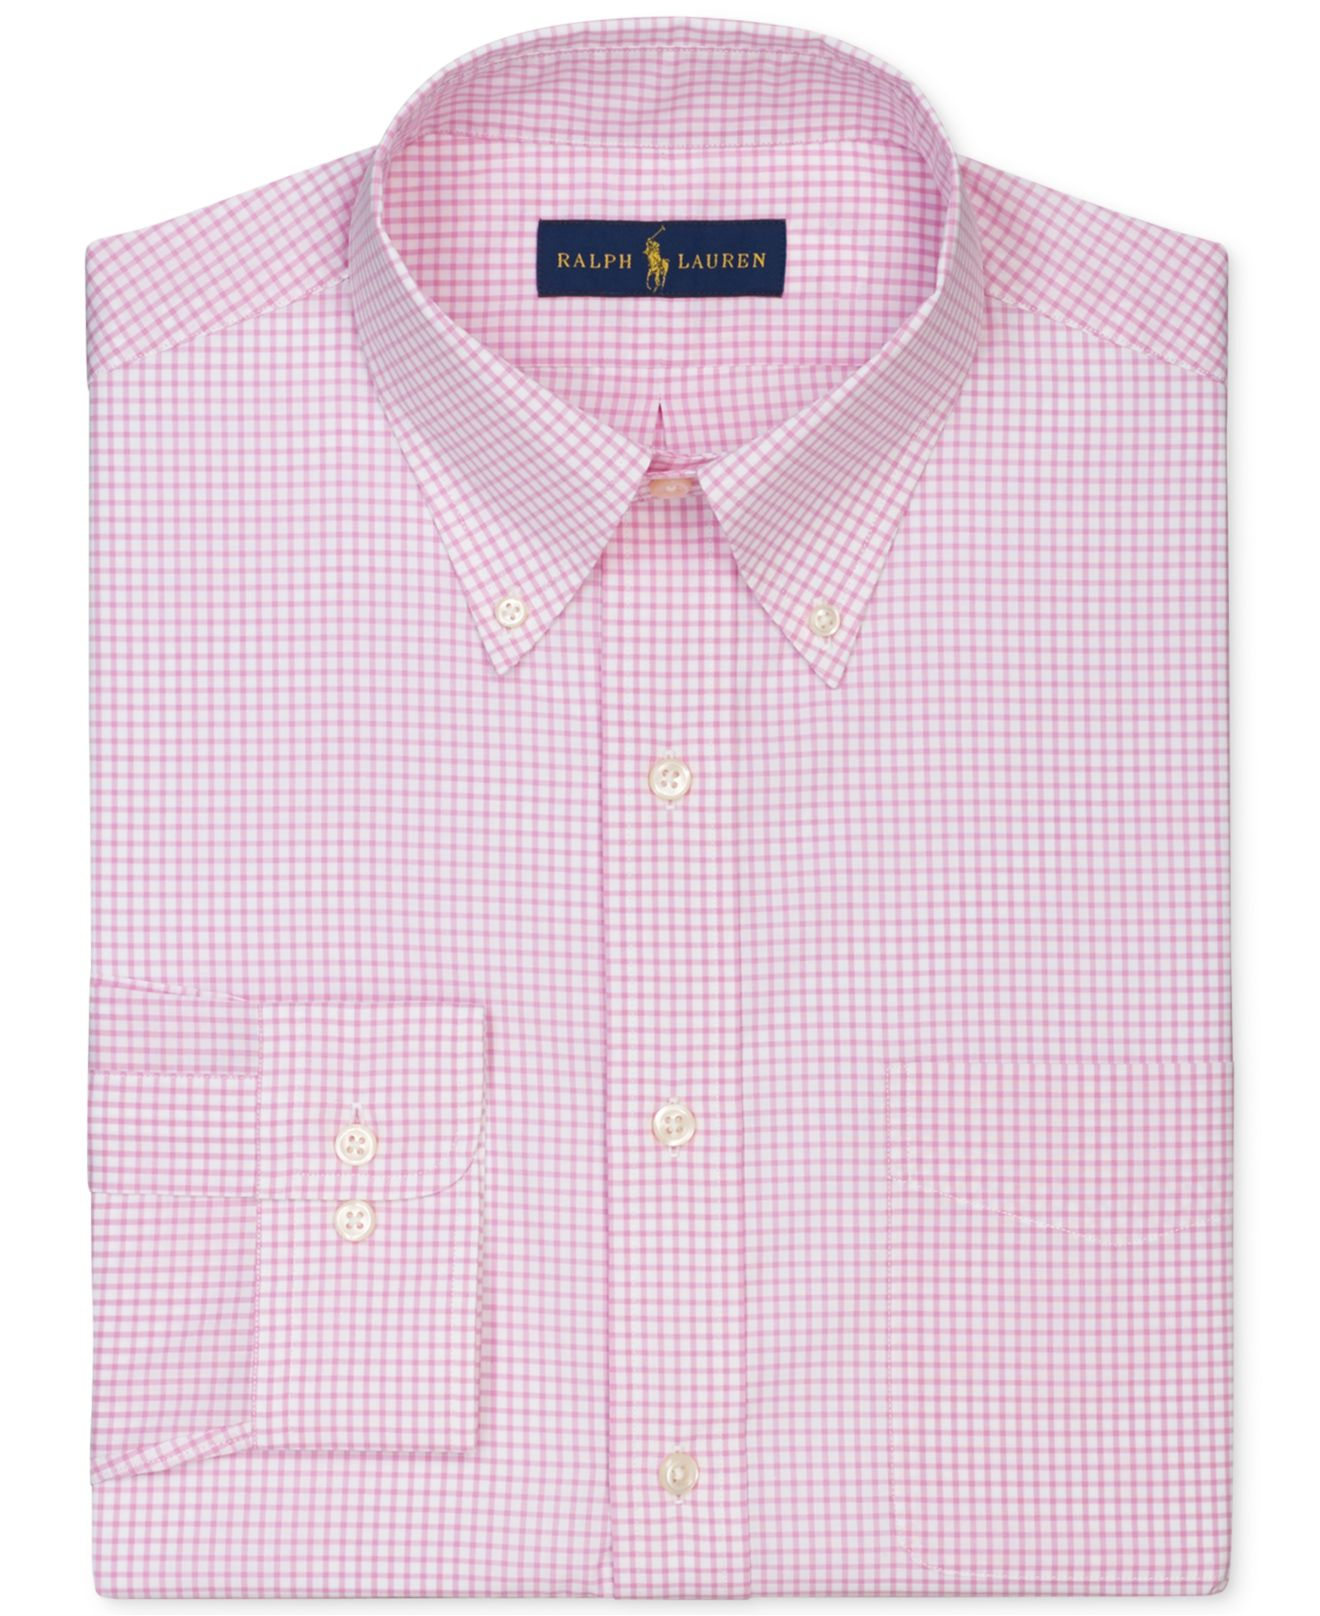 Polo ralph lauren gingham dress shirt in pink for men lyst for Pink checkered dress shirt